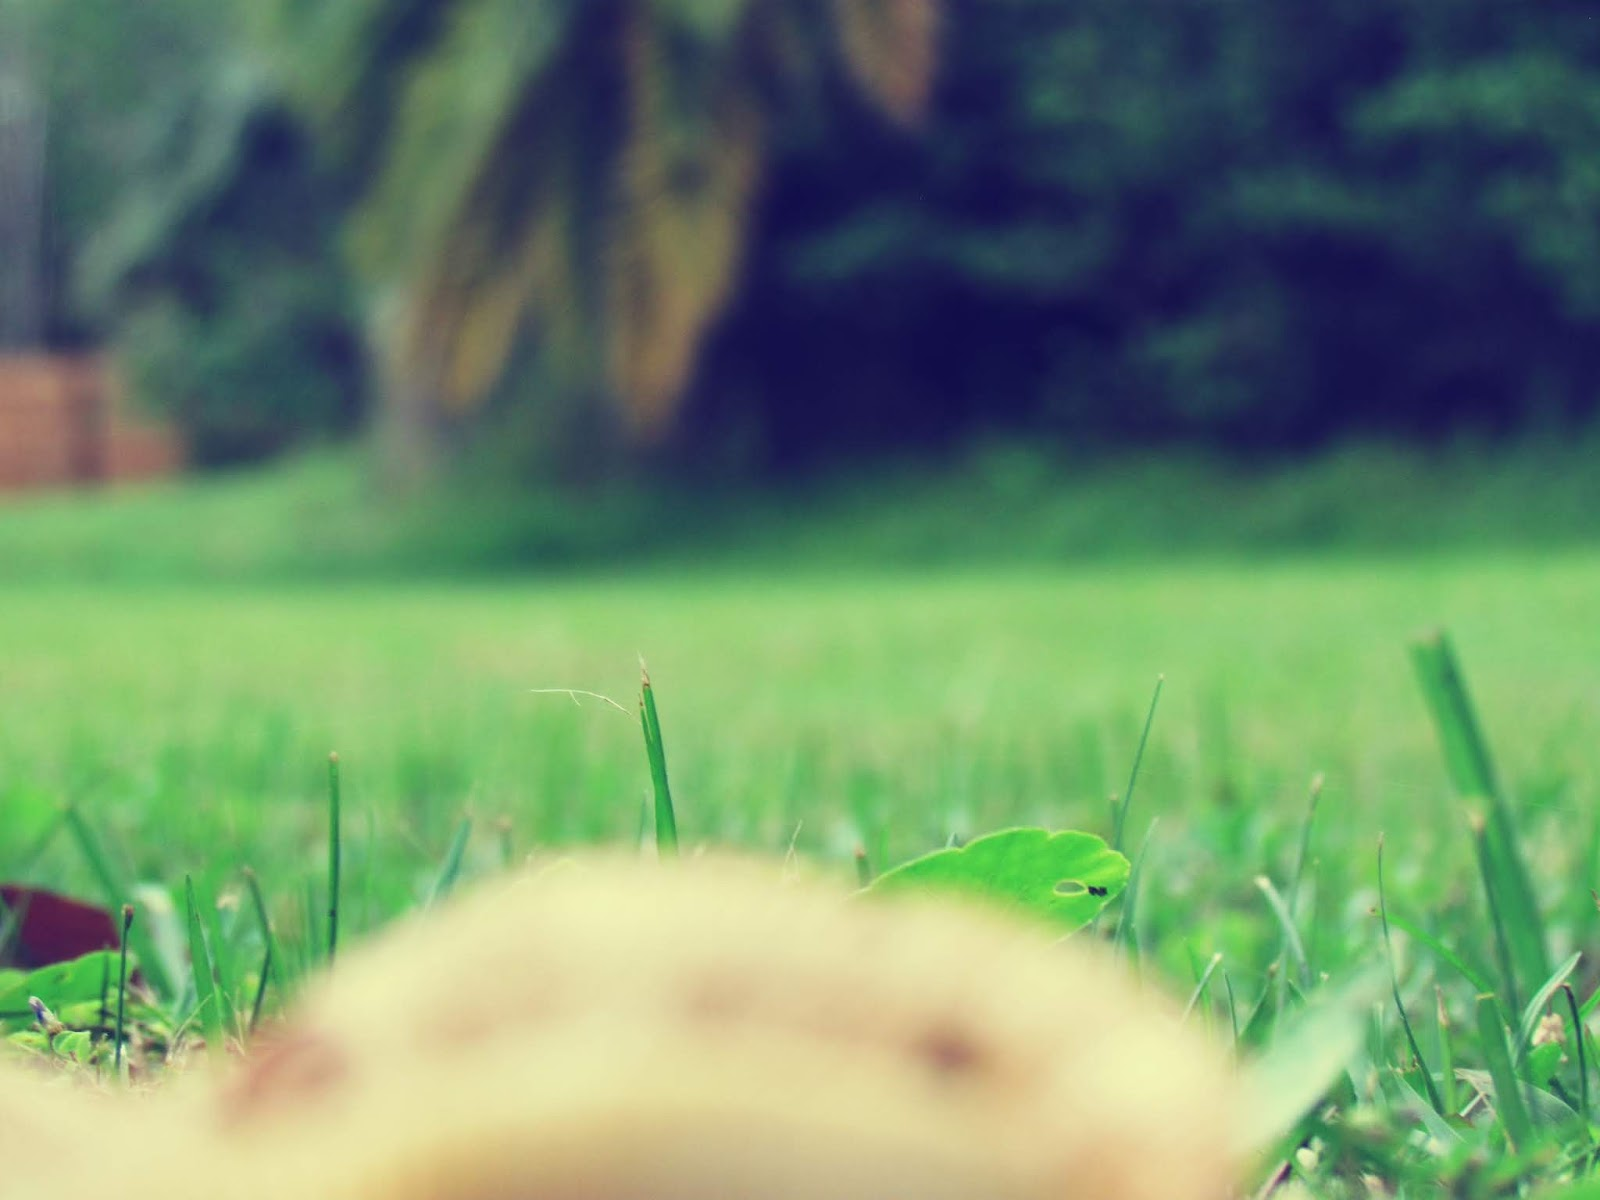 Sunny, Tropical Florida Backyard With Growing Mushroom Fungus